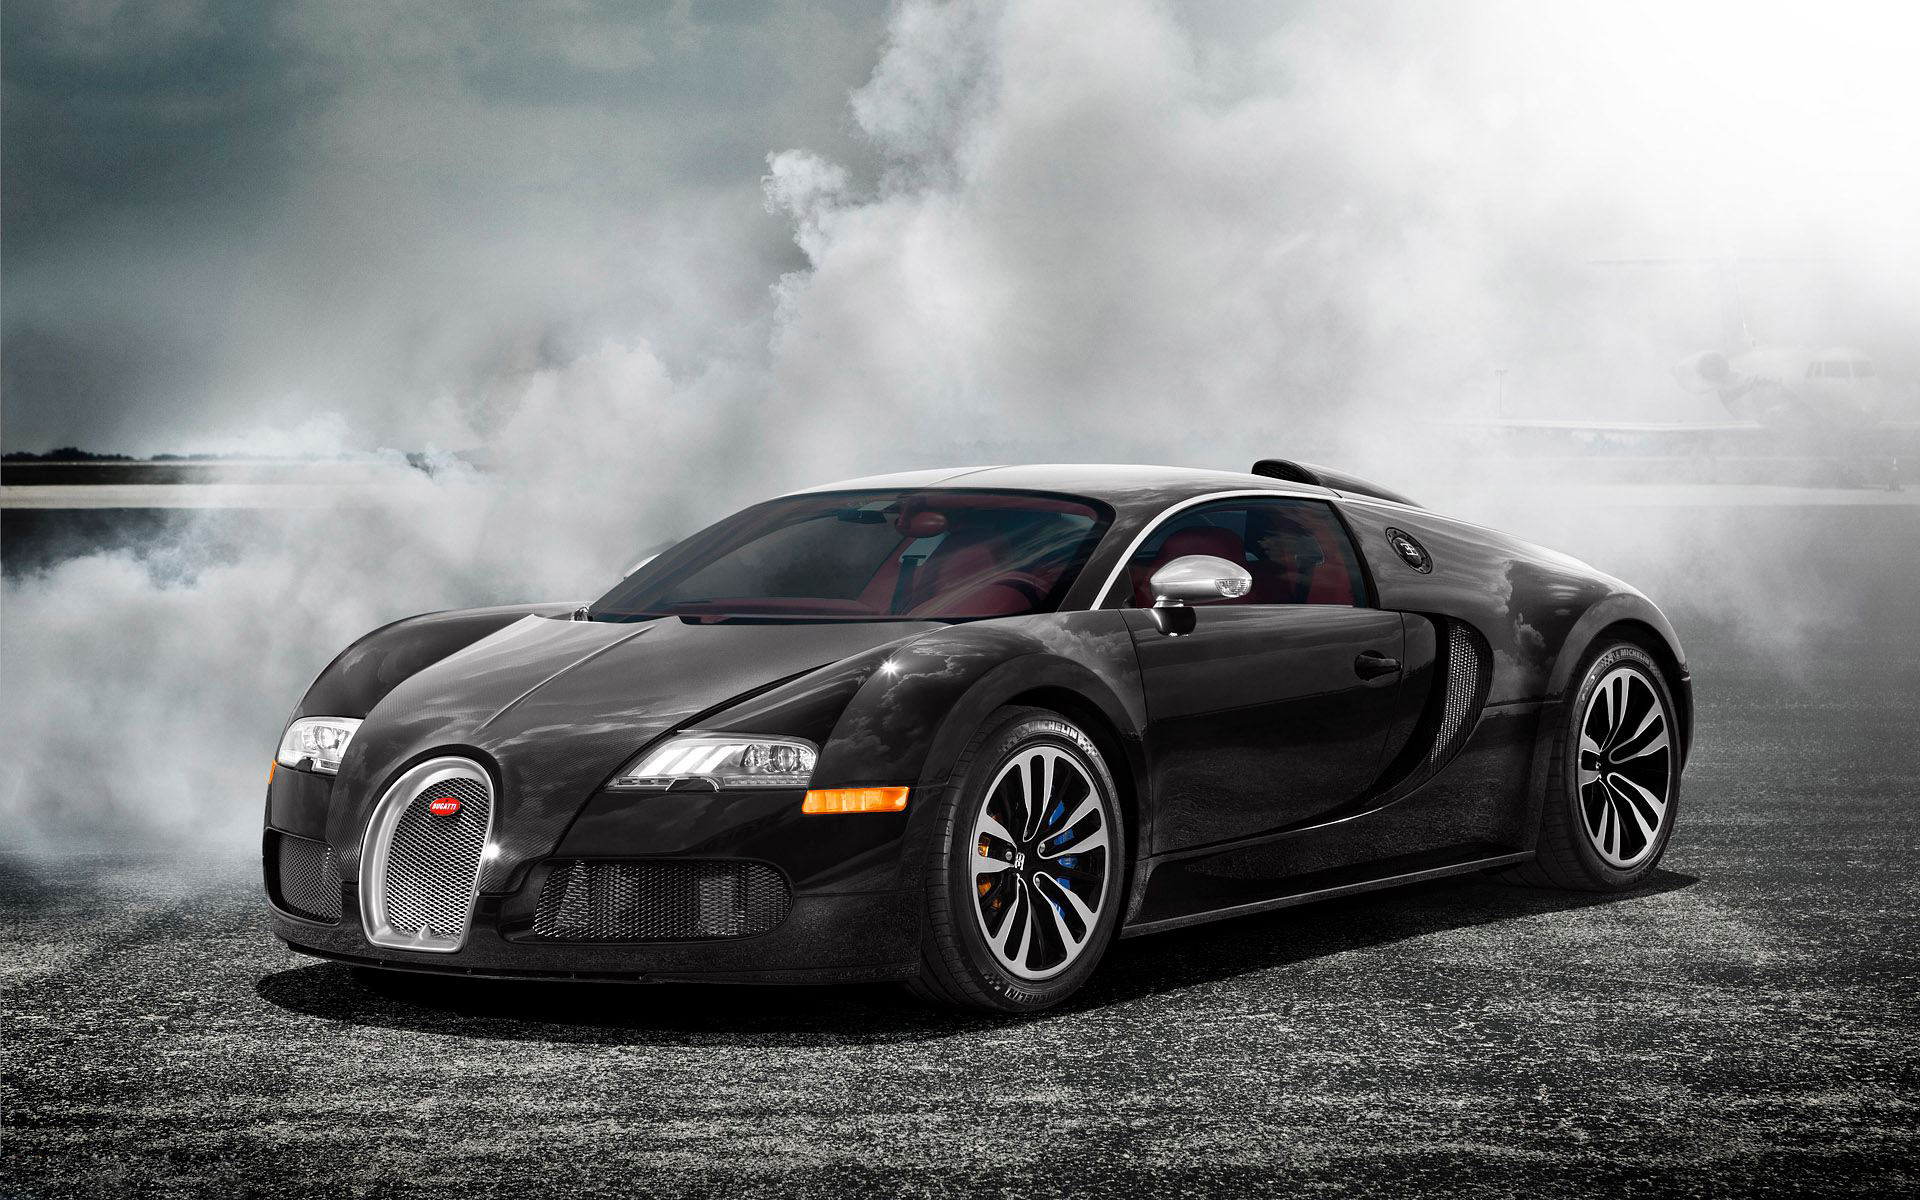 76 Bugatti Veyron Wallpaper On Wallpapersafari